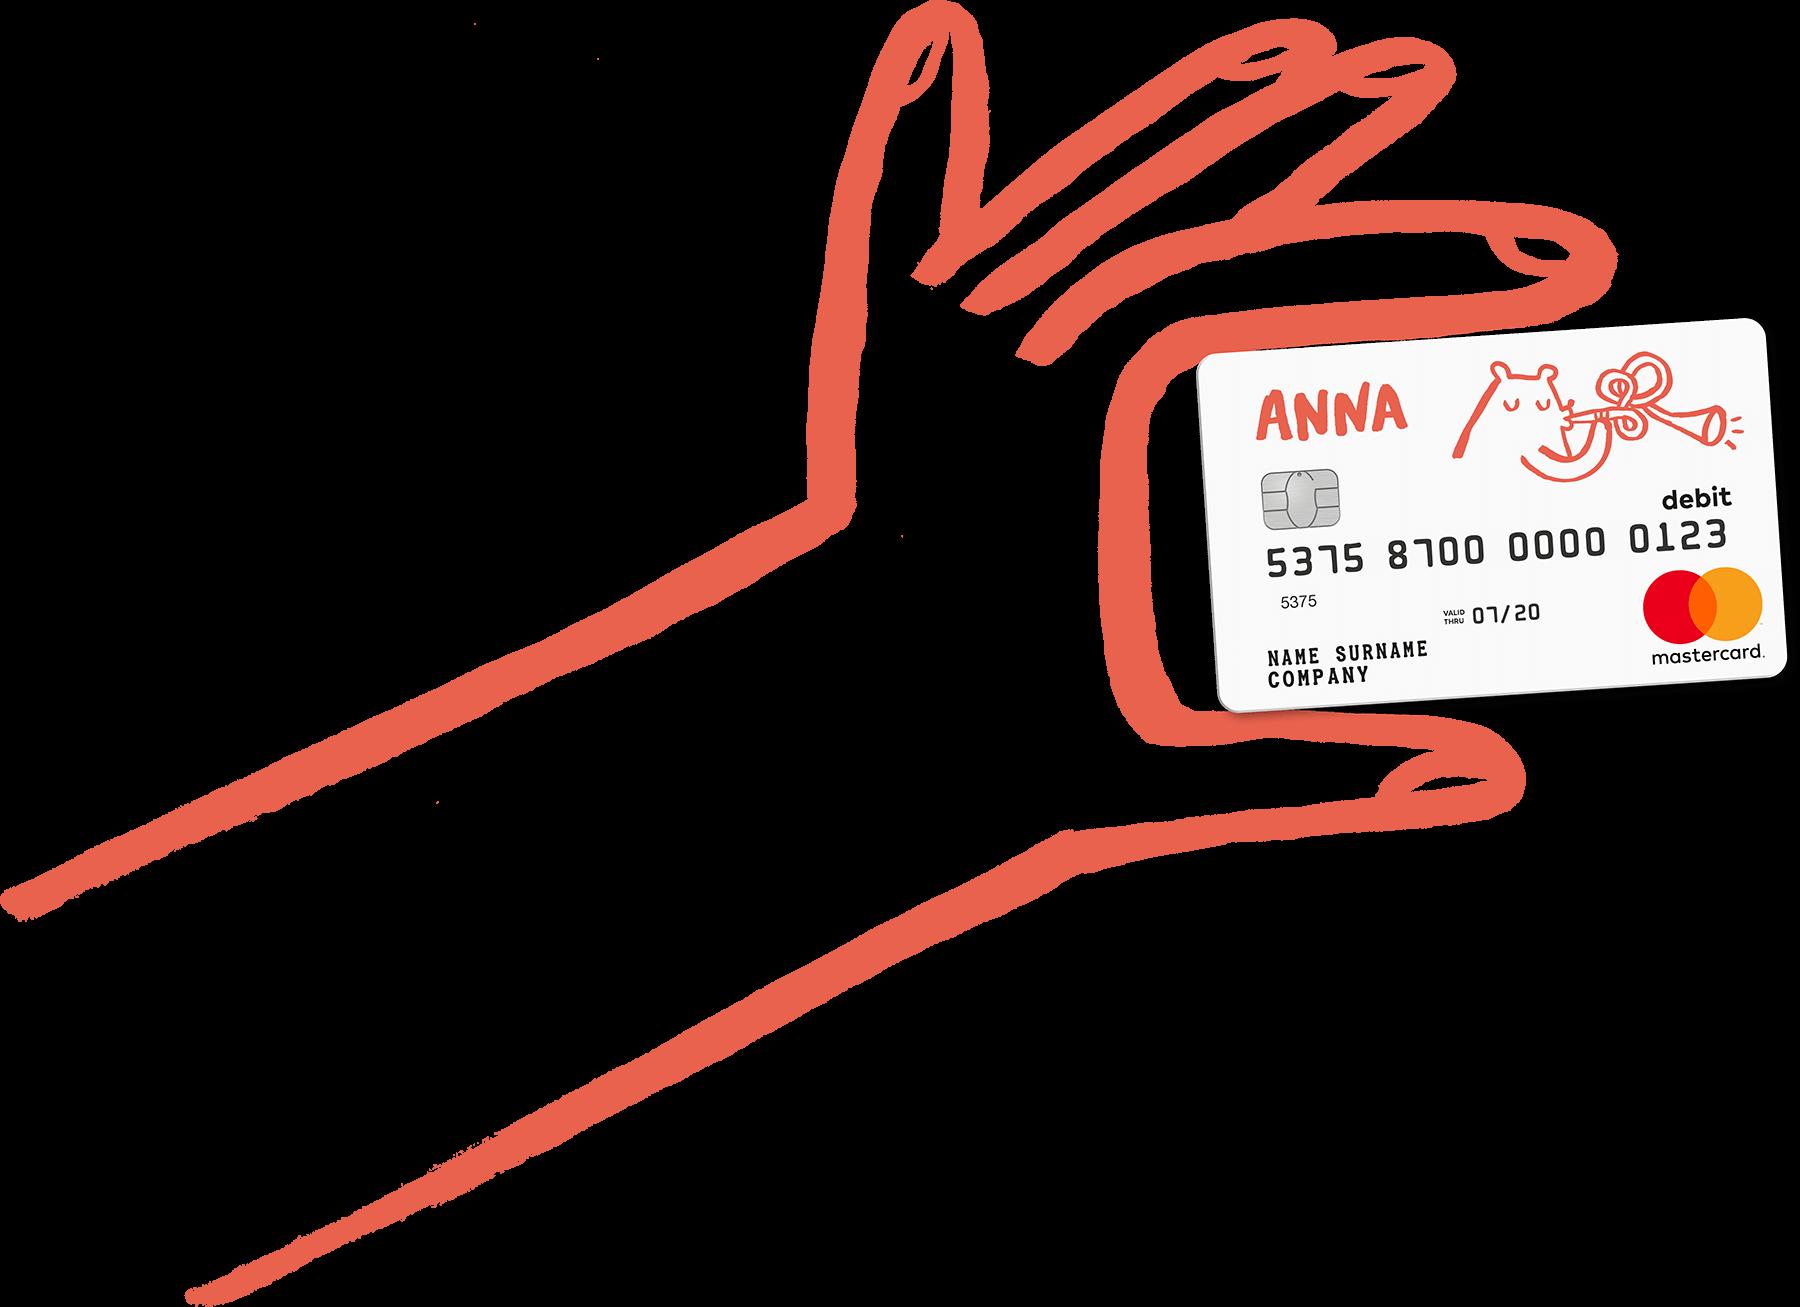 ANNA card